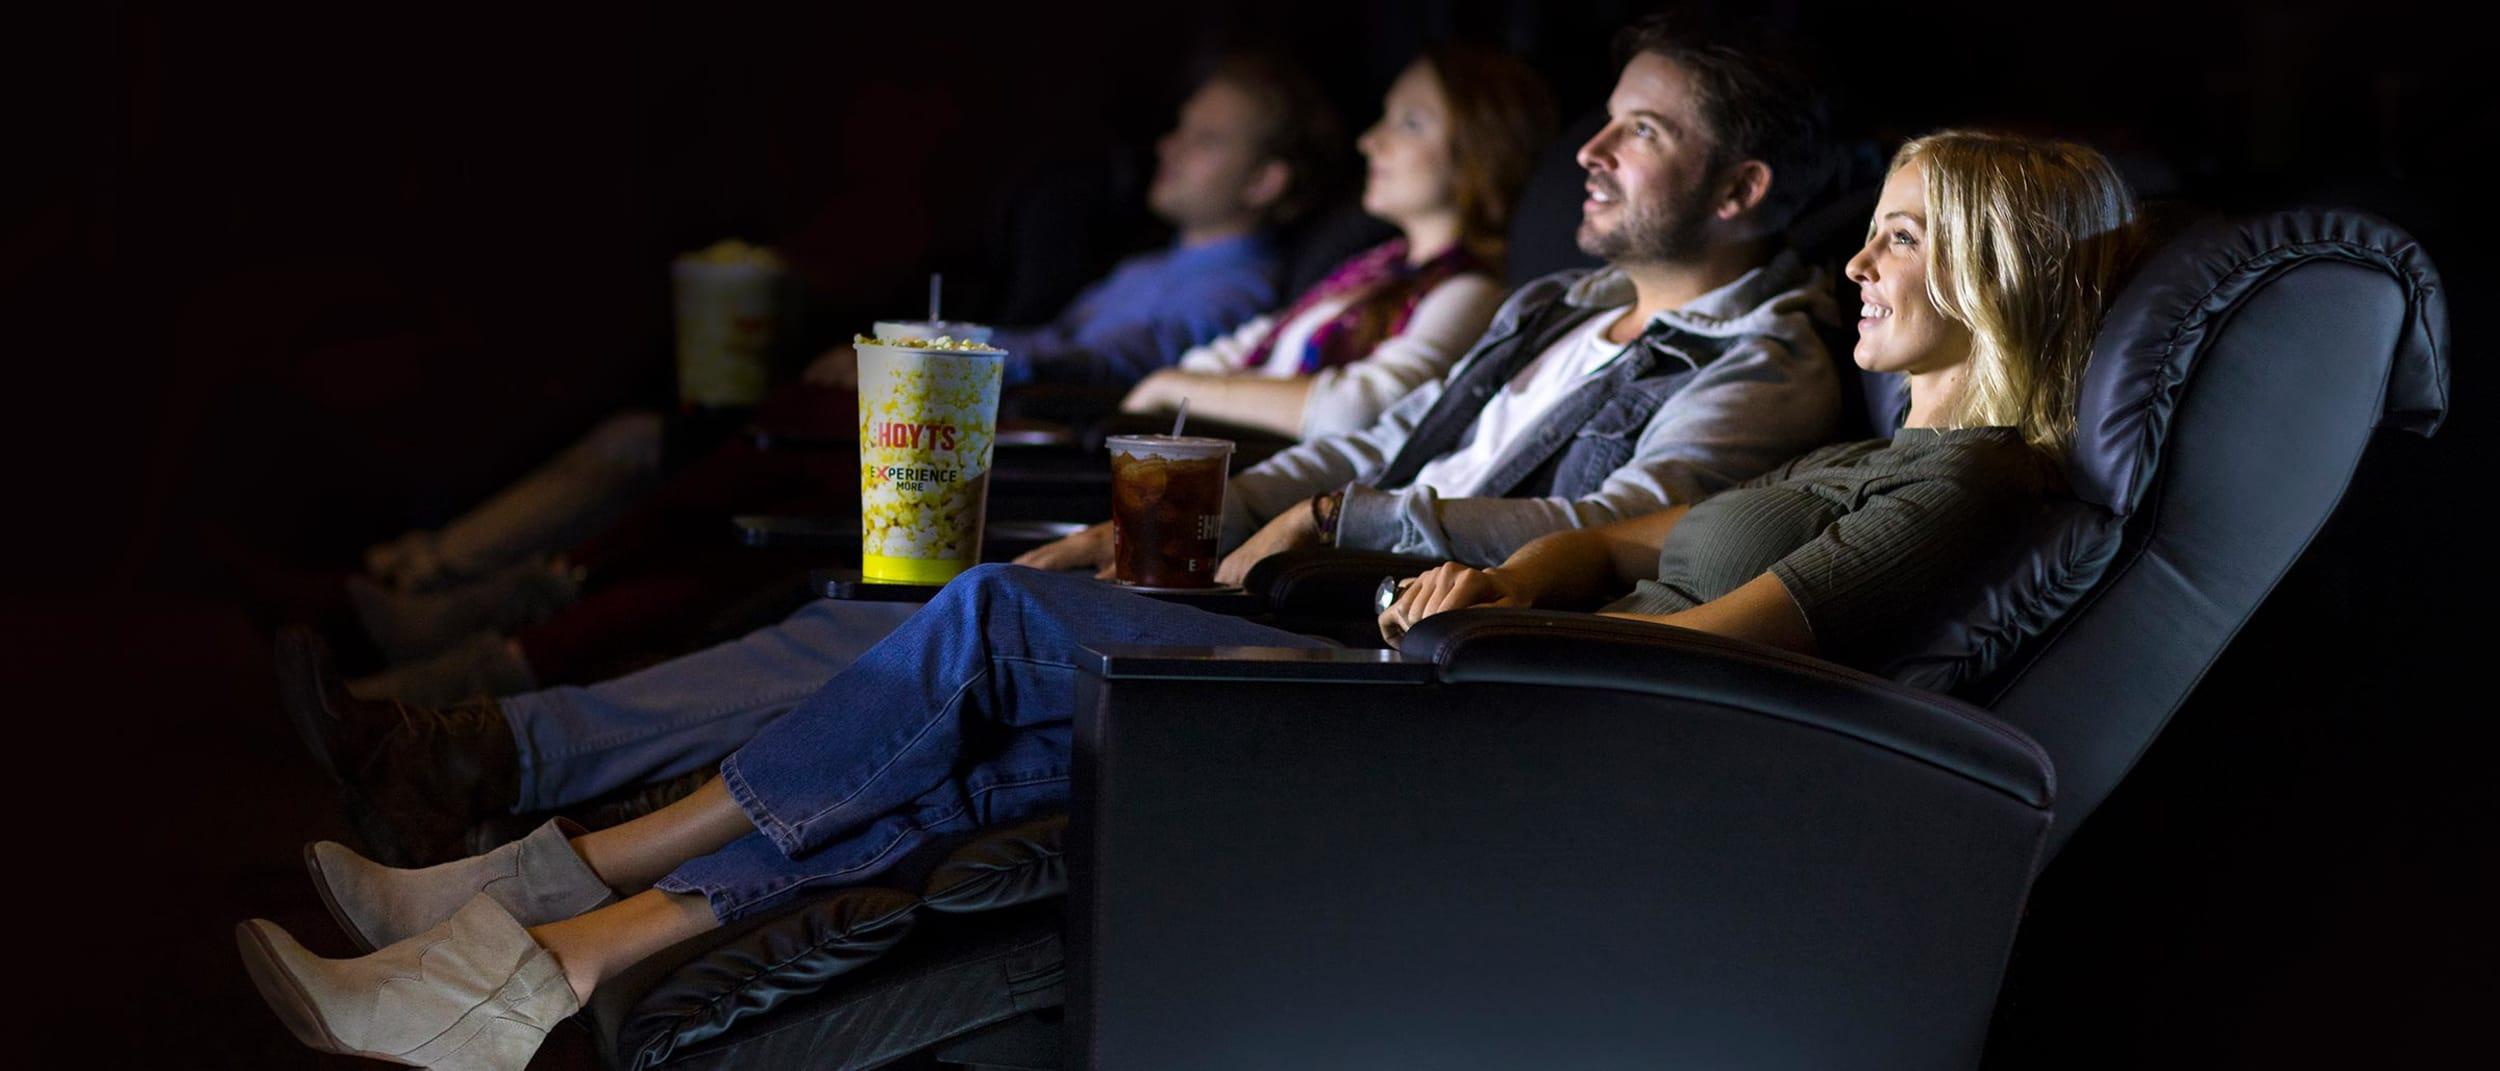 Movies at woden